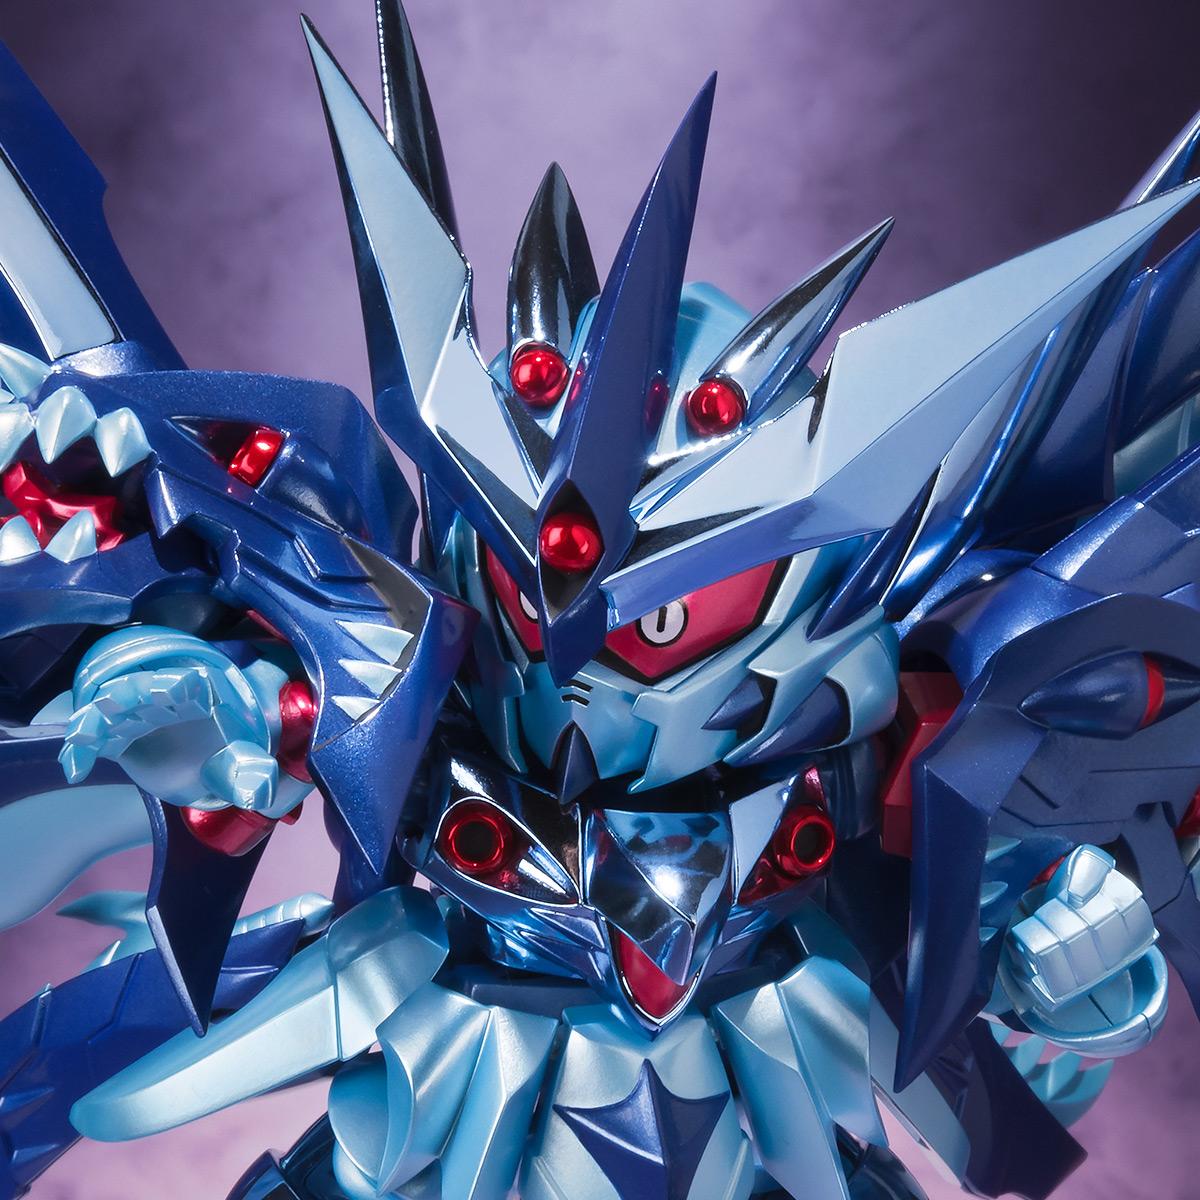 img_sdx_superior_dragon_dark_01.jpg